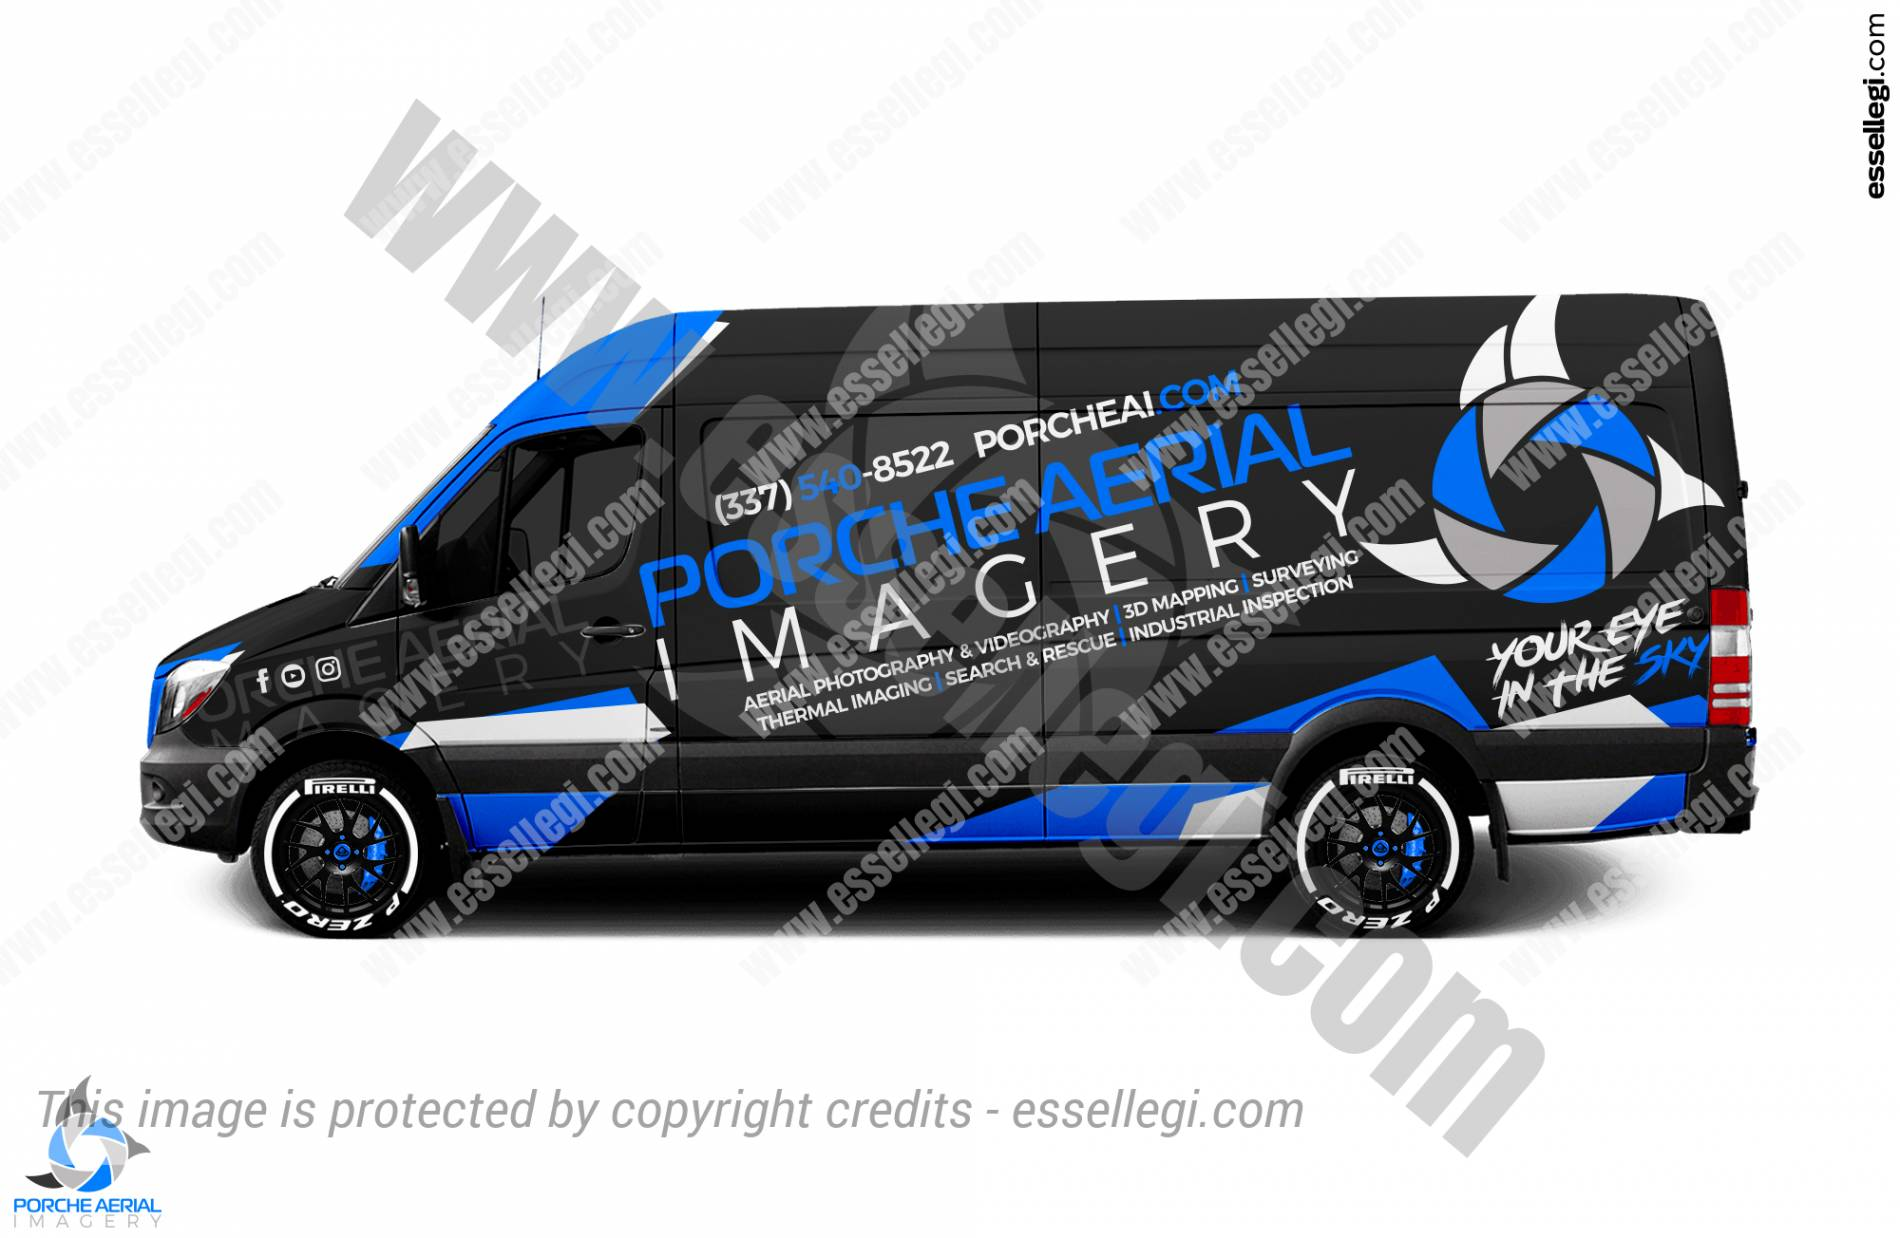 Sprinter Wrap Design. Mercedes Sprinter 2500 | Van Wrap Design by Essellegi. Van Signs, Van Signage, Van Wrapping, Van Signwriting, Van Wrap Designer, Signs for Van, Van Logo, Van Graphic by Essellegi.